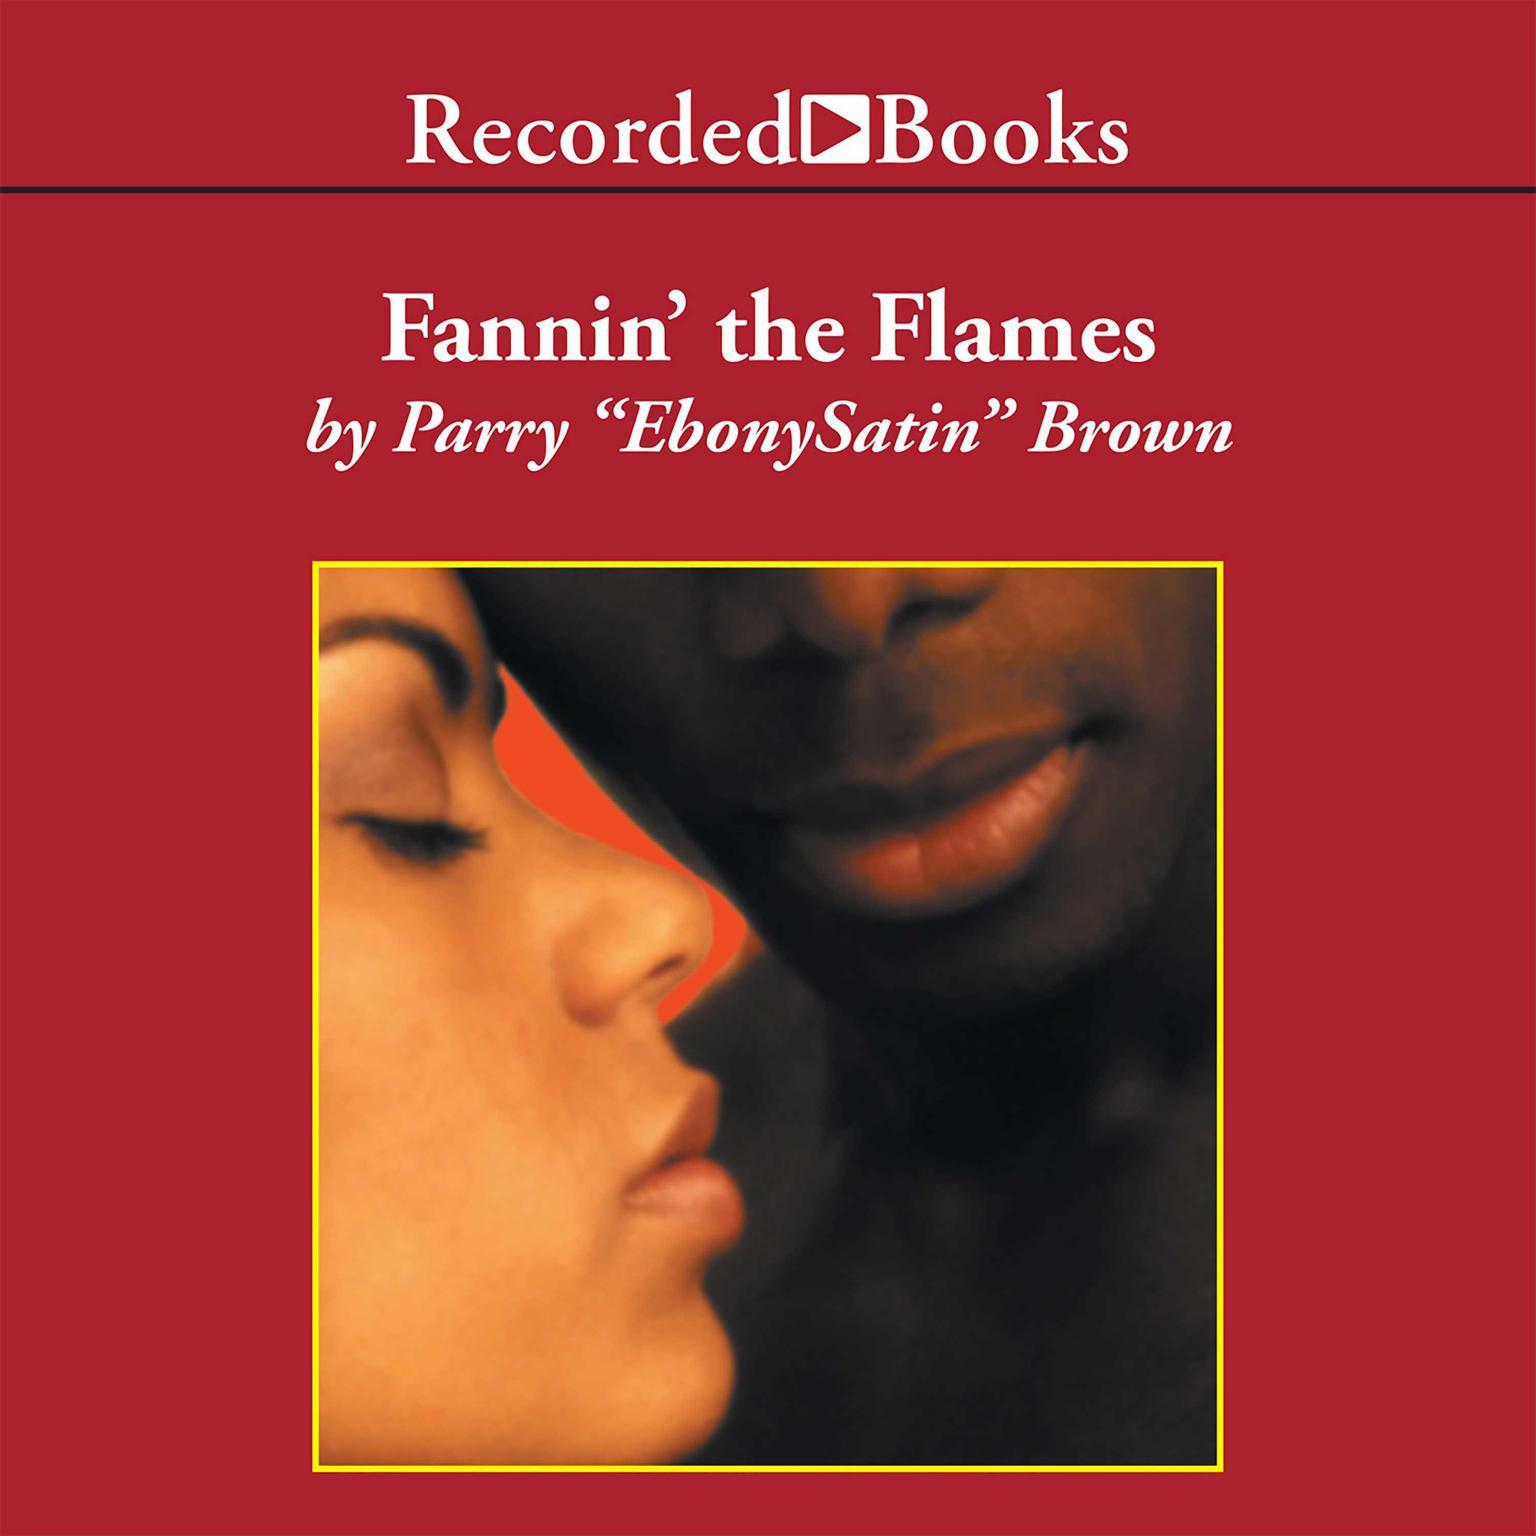 Printable Fannin' the Flames: A Novel Audiobook Cover Art